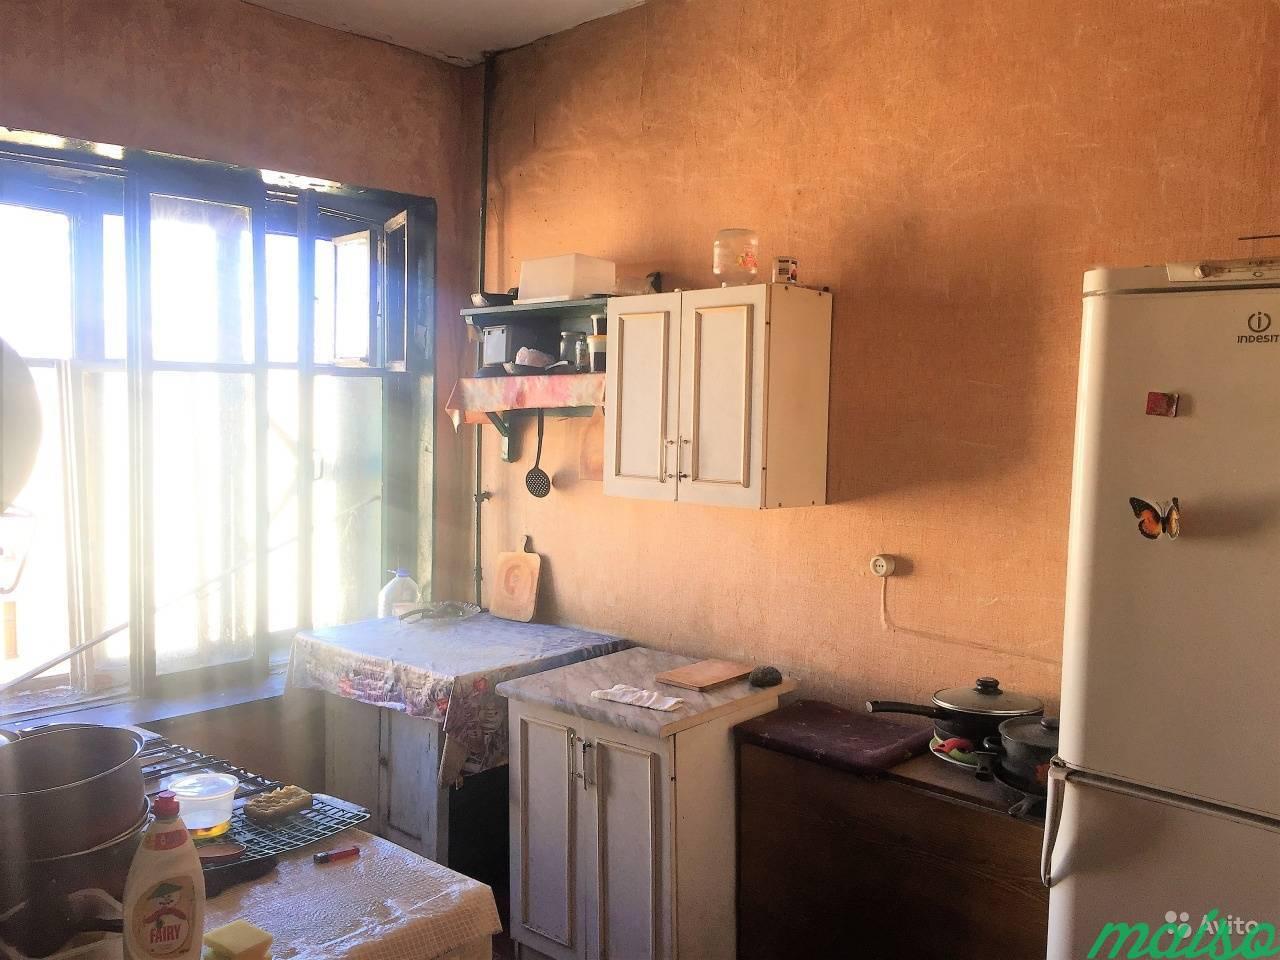 Комната 18.5 м² в 4-к, 5/6 эт. в Санкт-Петербурге. Фото 5